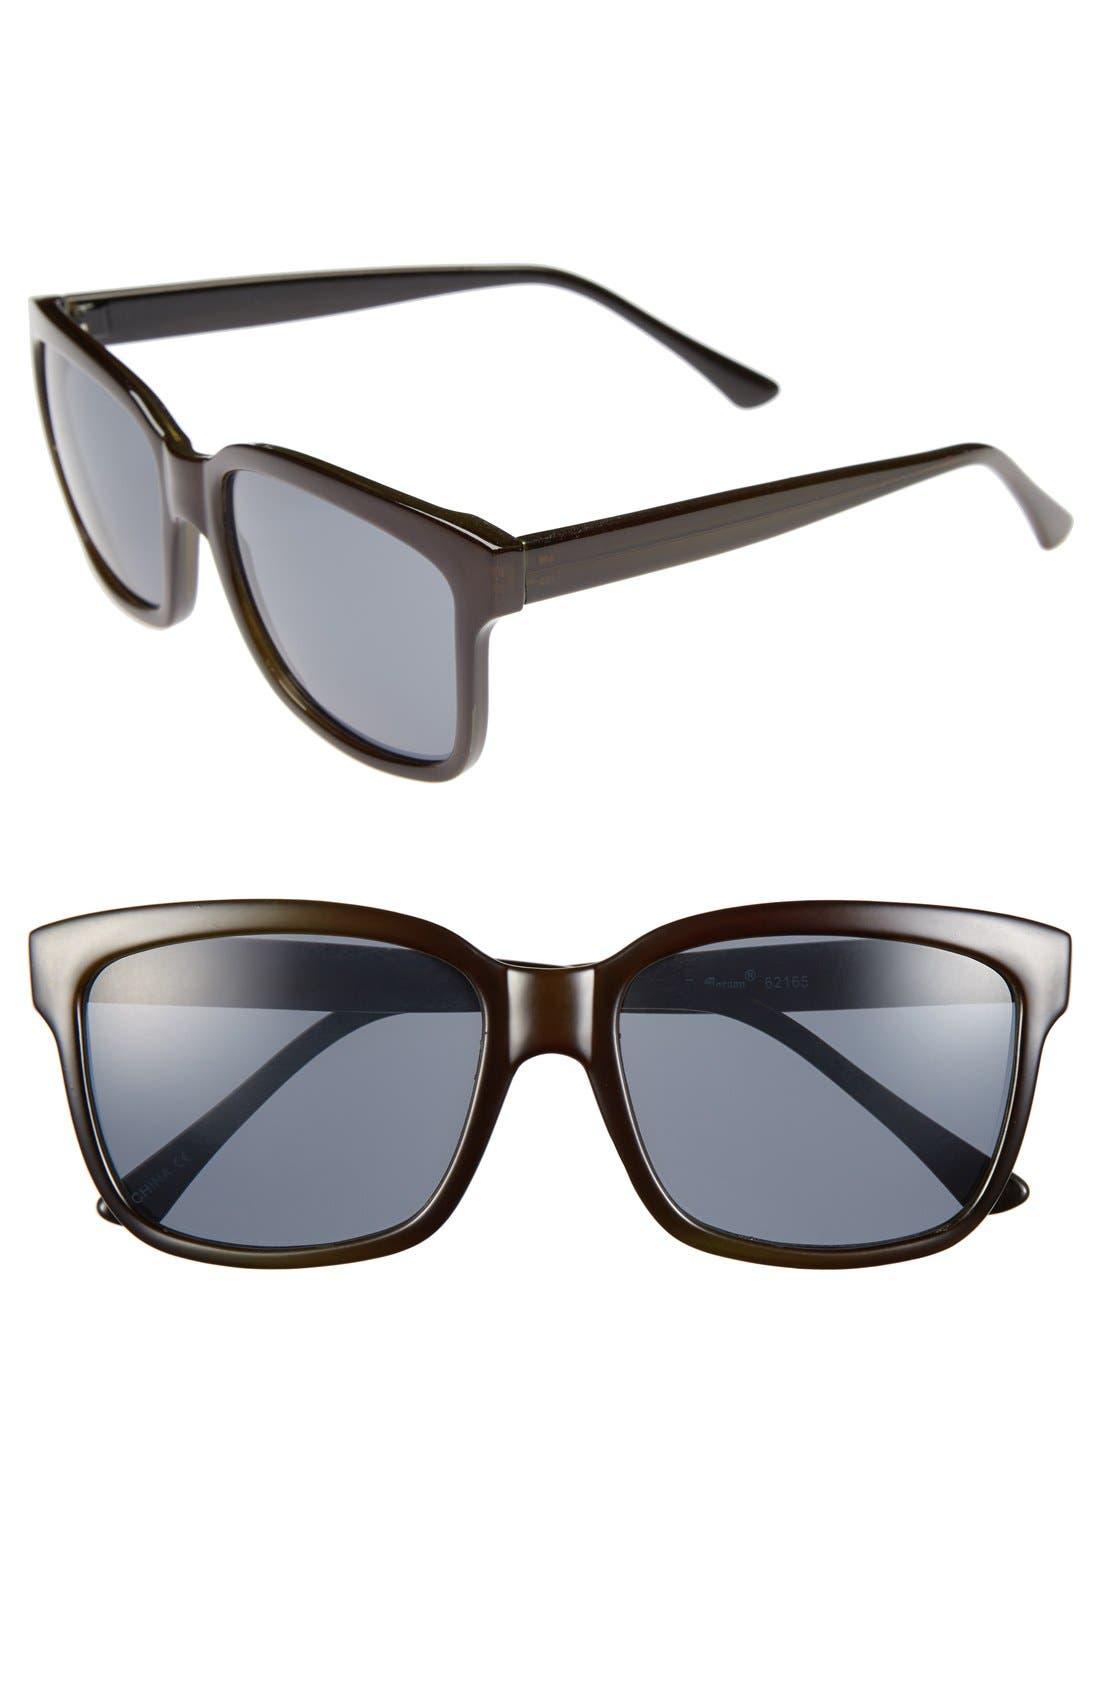 Alternate Image 1 Selected - A.J. Morgan 'Beechers' 55mm Sunglasses